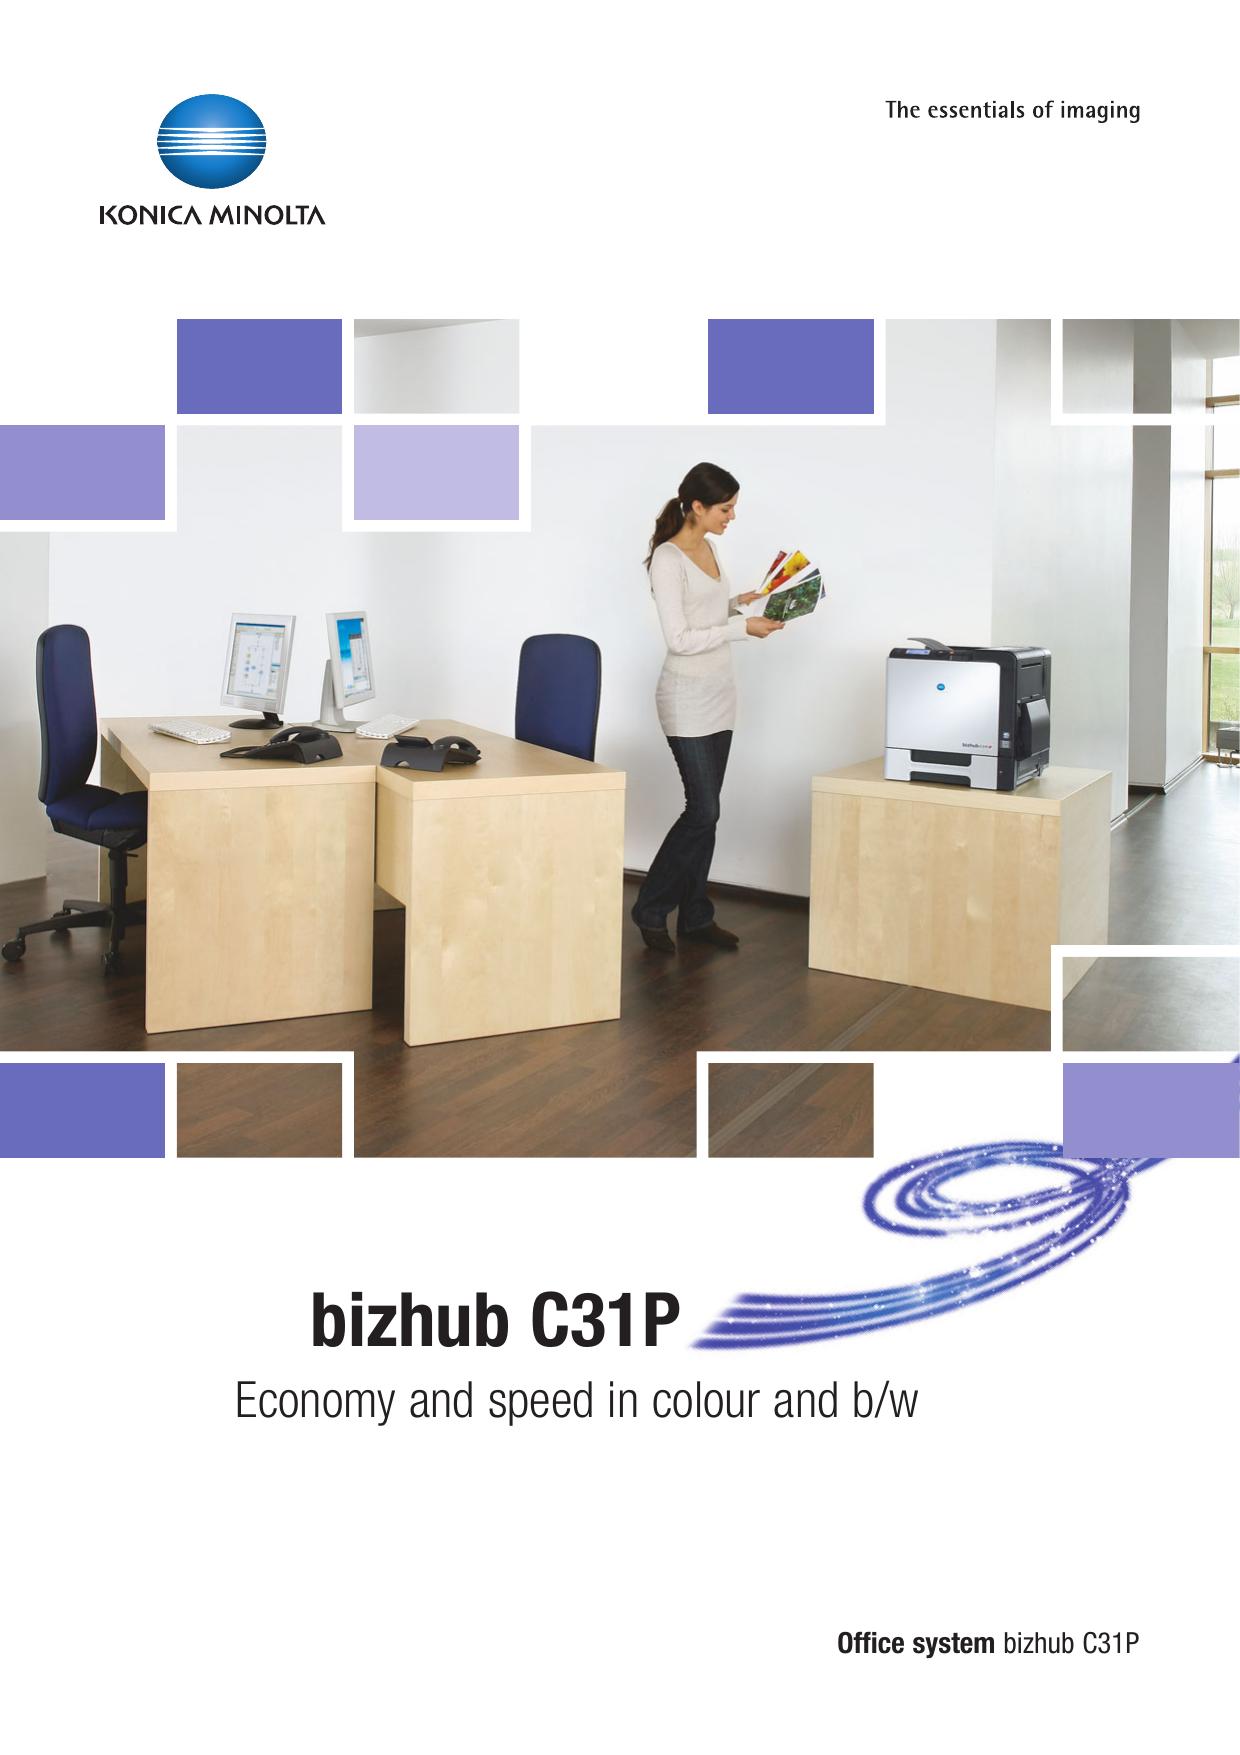 BIZHUB C31P DRIVERS FOR WINDOWS XP